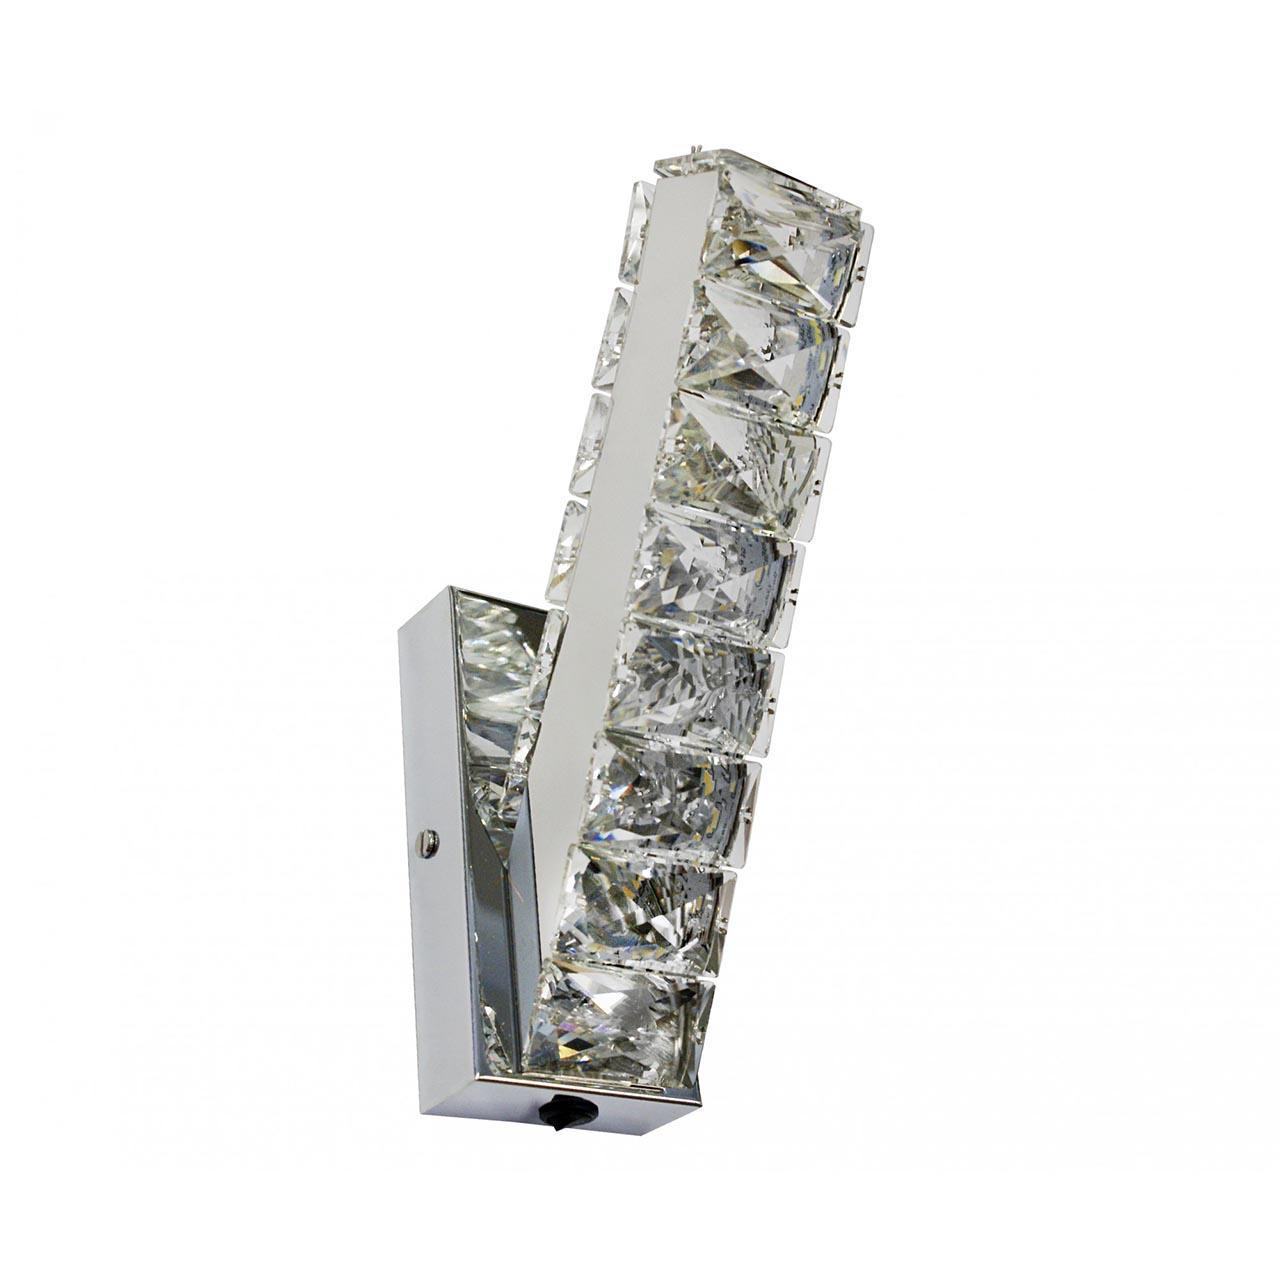 Бра Kink Light Тор-Кристалл 08607(3000-6000К) kink light бра kink light аква кристалл 08620